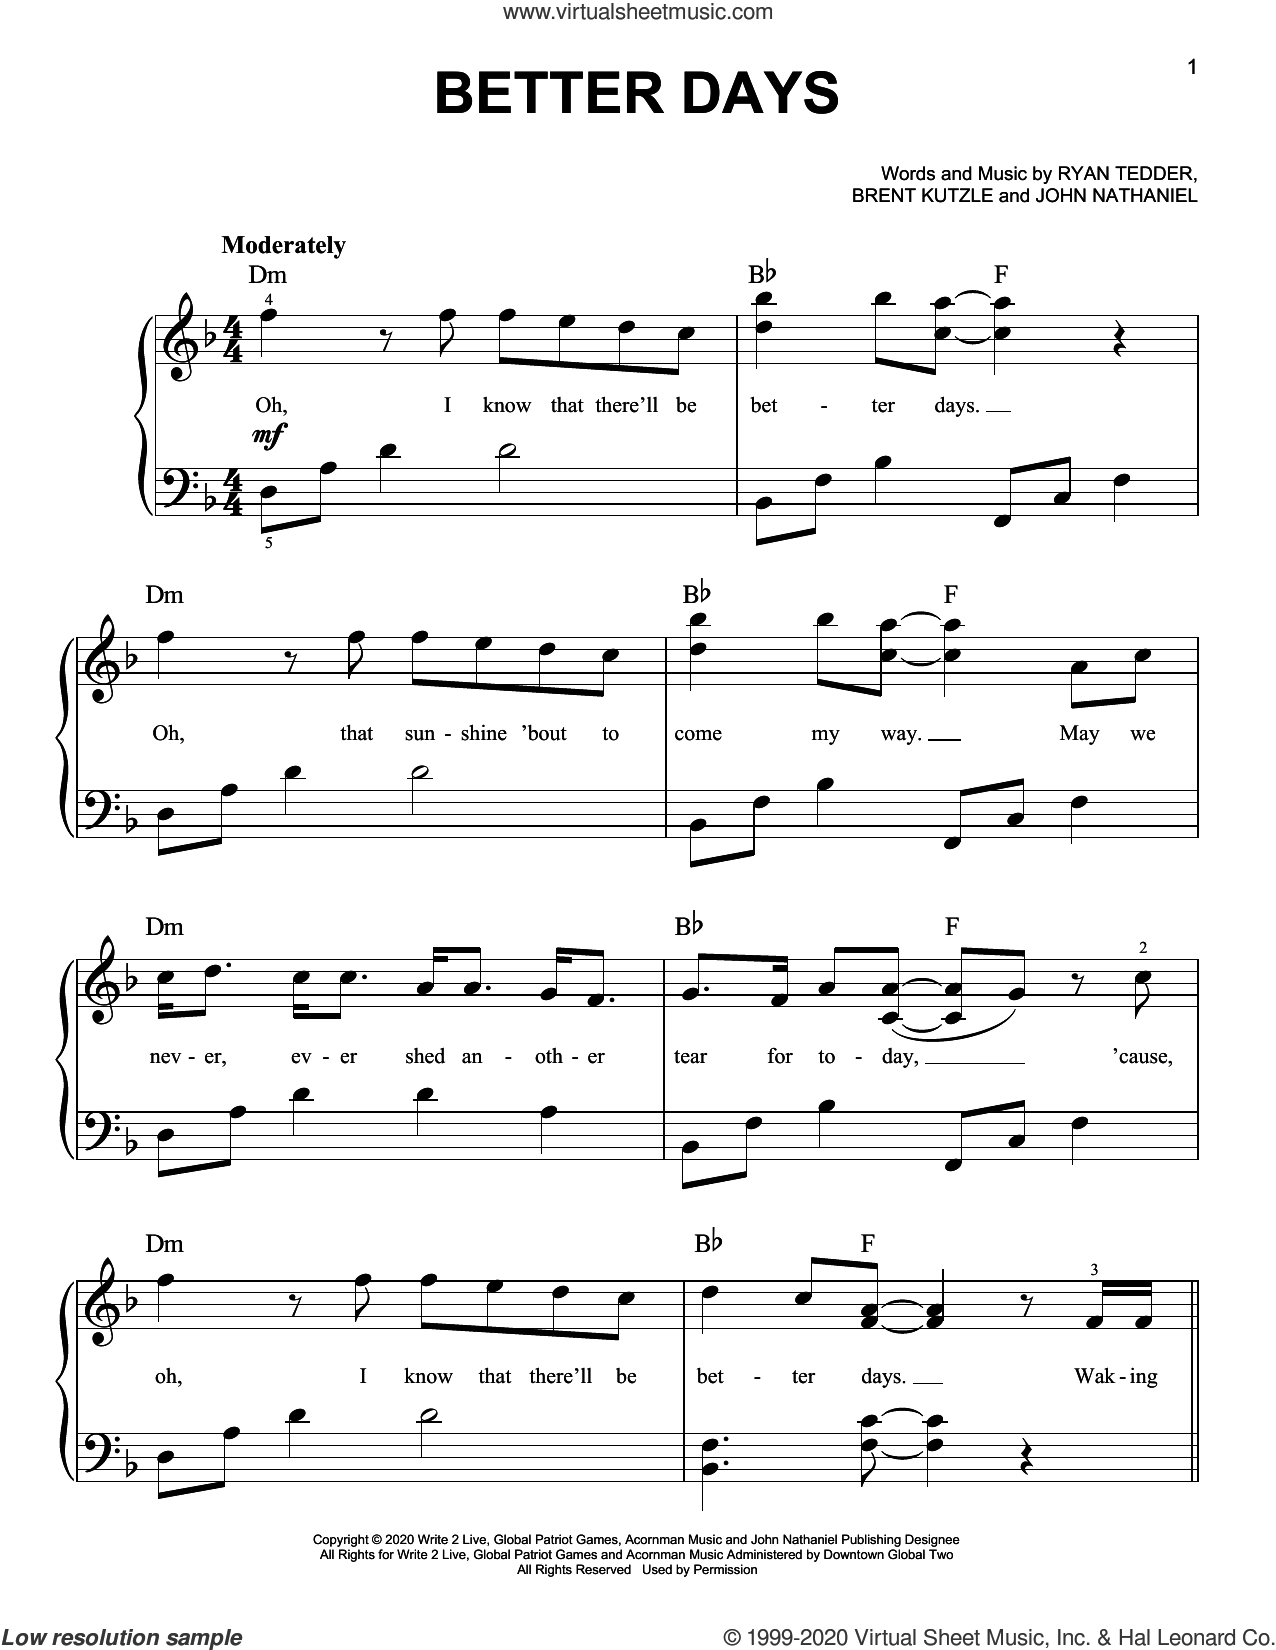 Better Days, (easy) sheet music for piano solo by OneRepublic, Brent Kutzle, John Nathaniel and Ryan Tedder, easy skill level